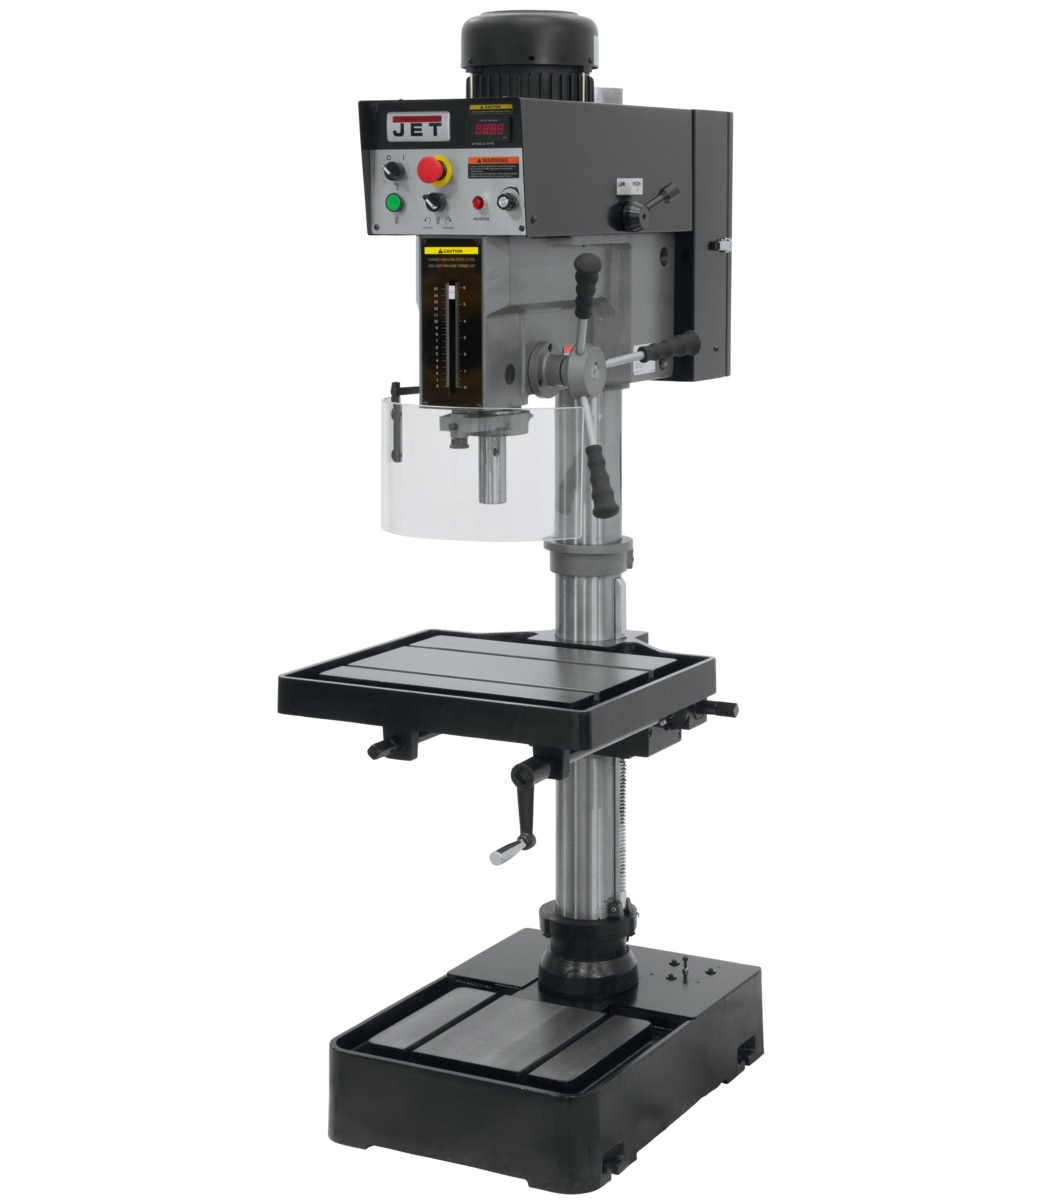 "J-2232AC, 20"" EVS Variable Speed Drill Press 220V 3Ph"